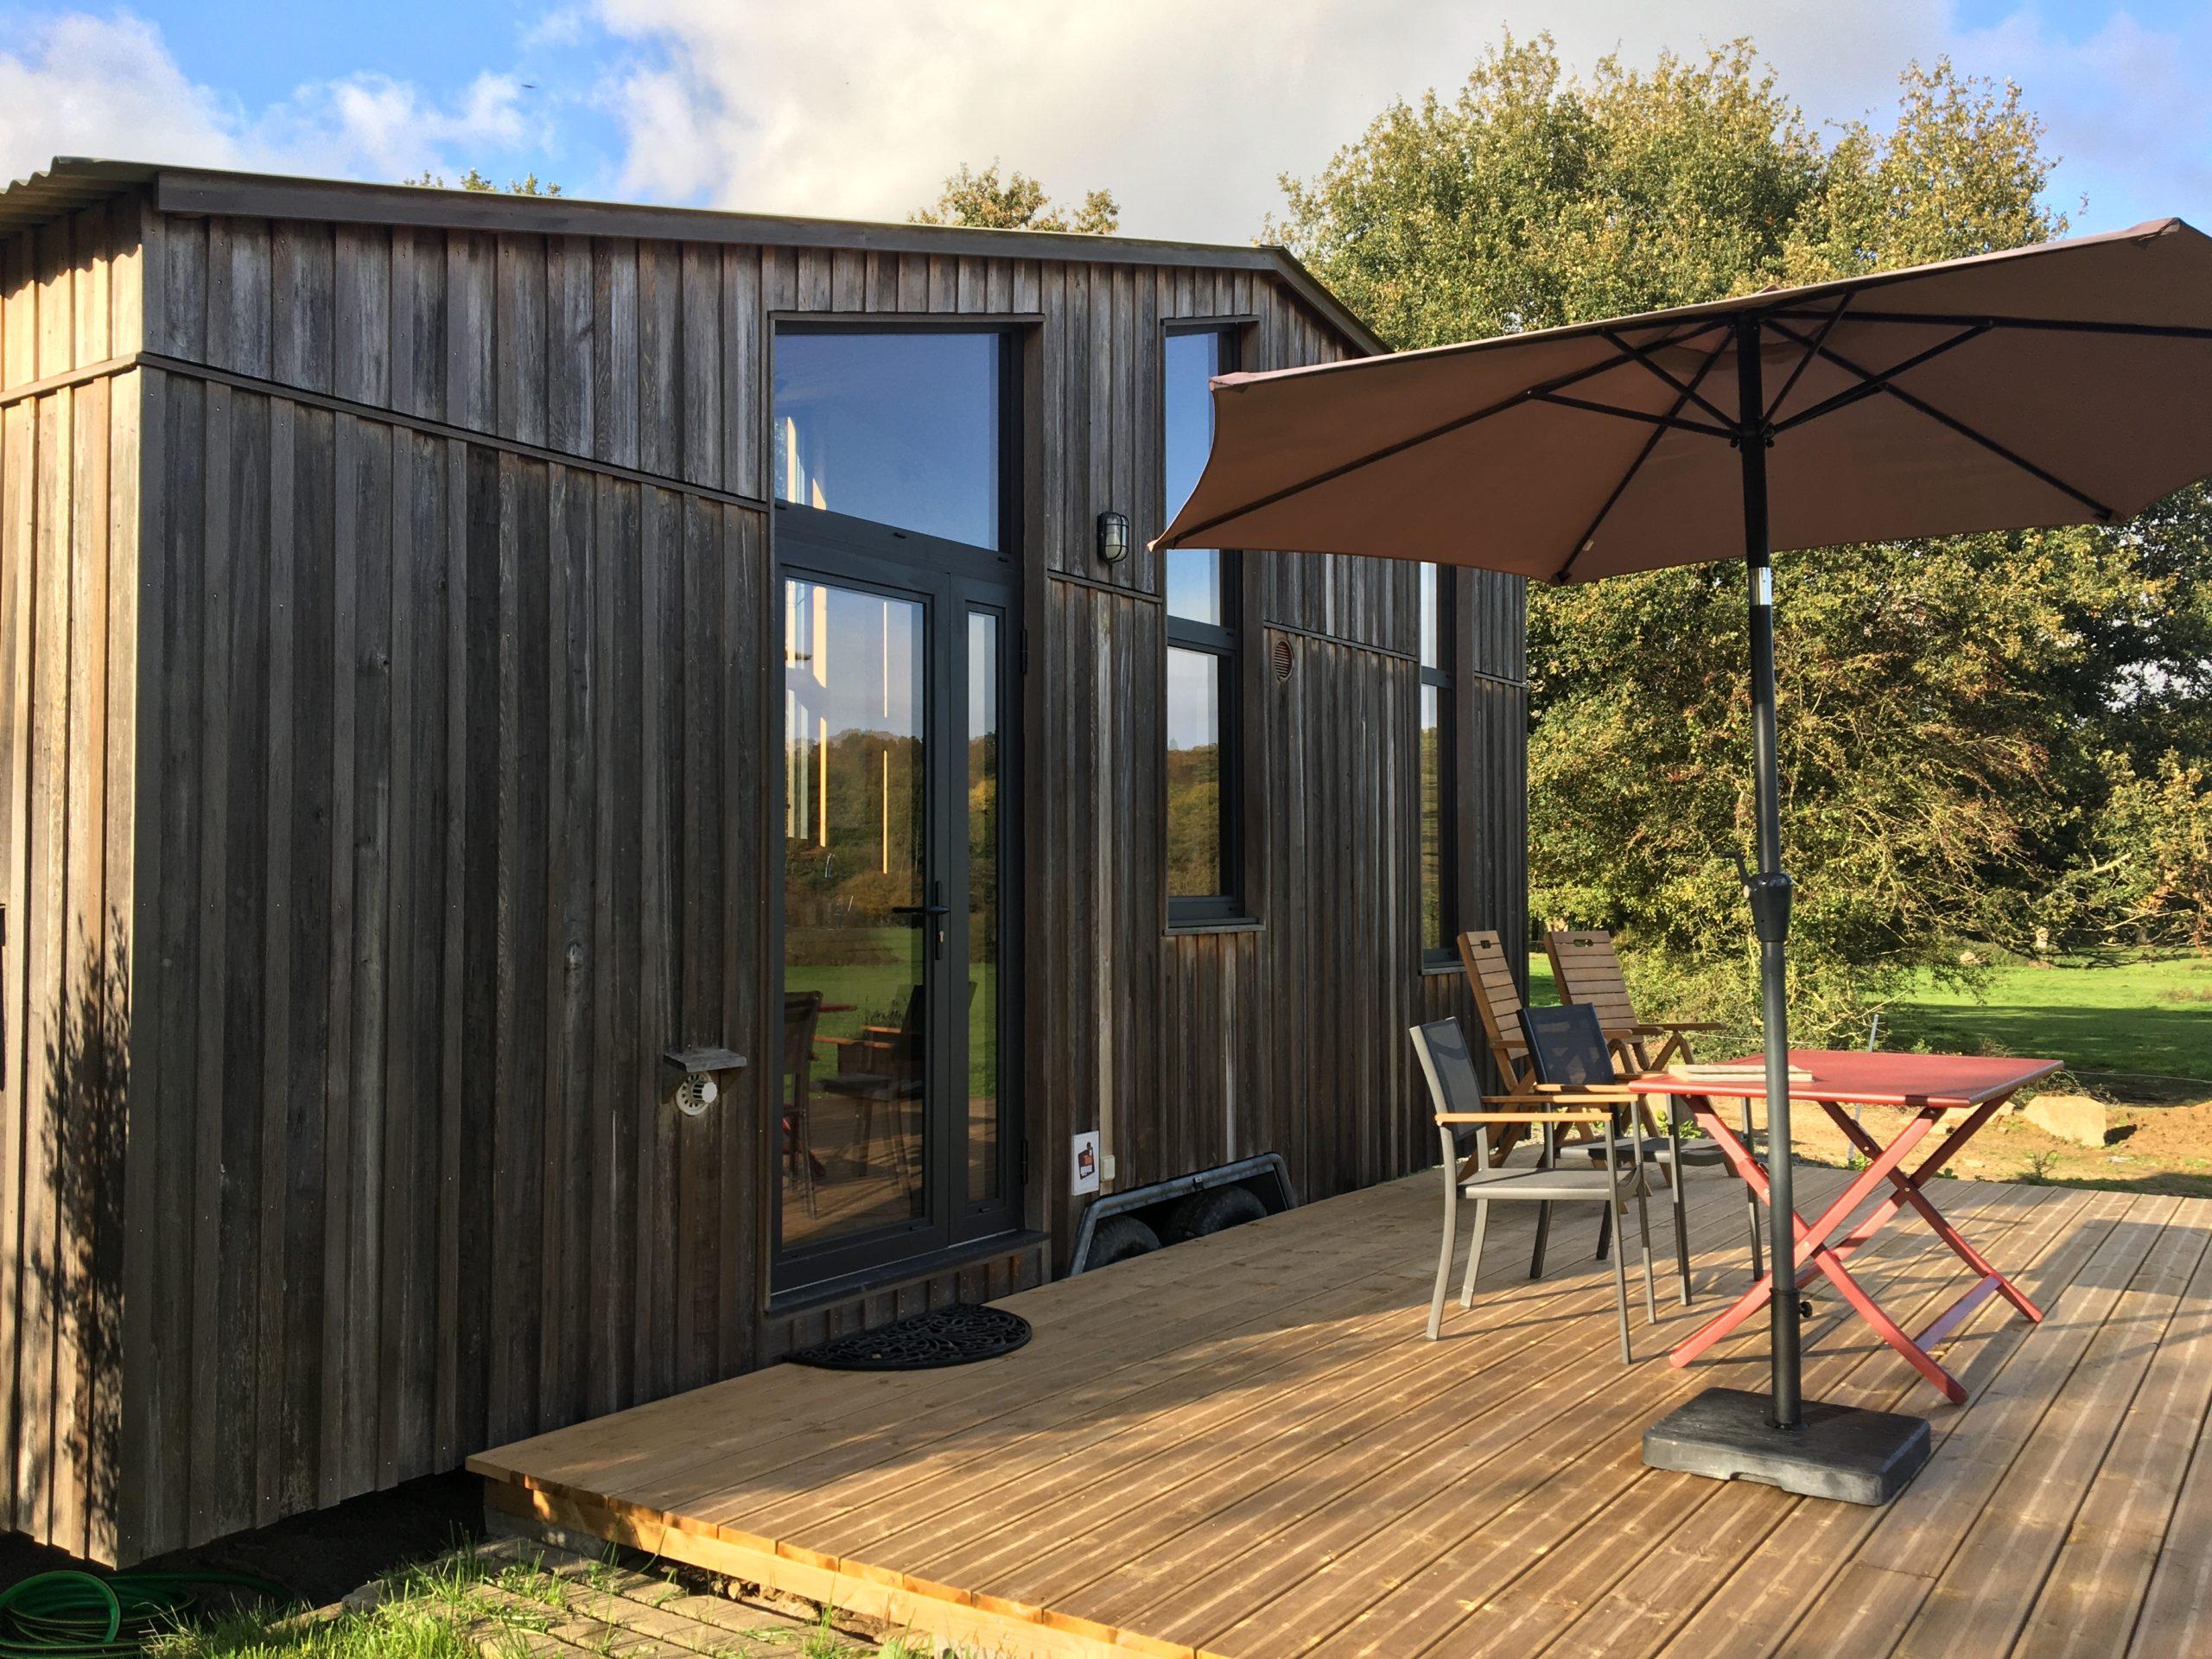 gros plan tiny house et terrasse en bois